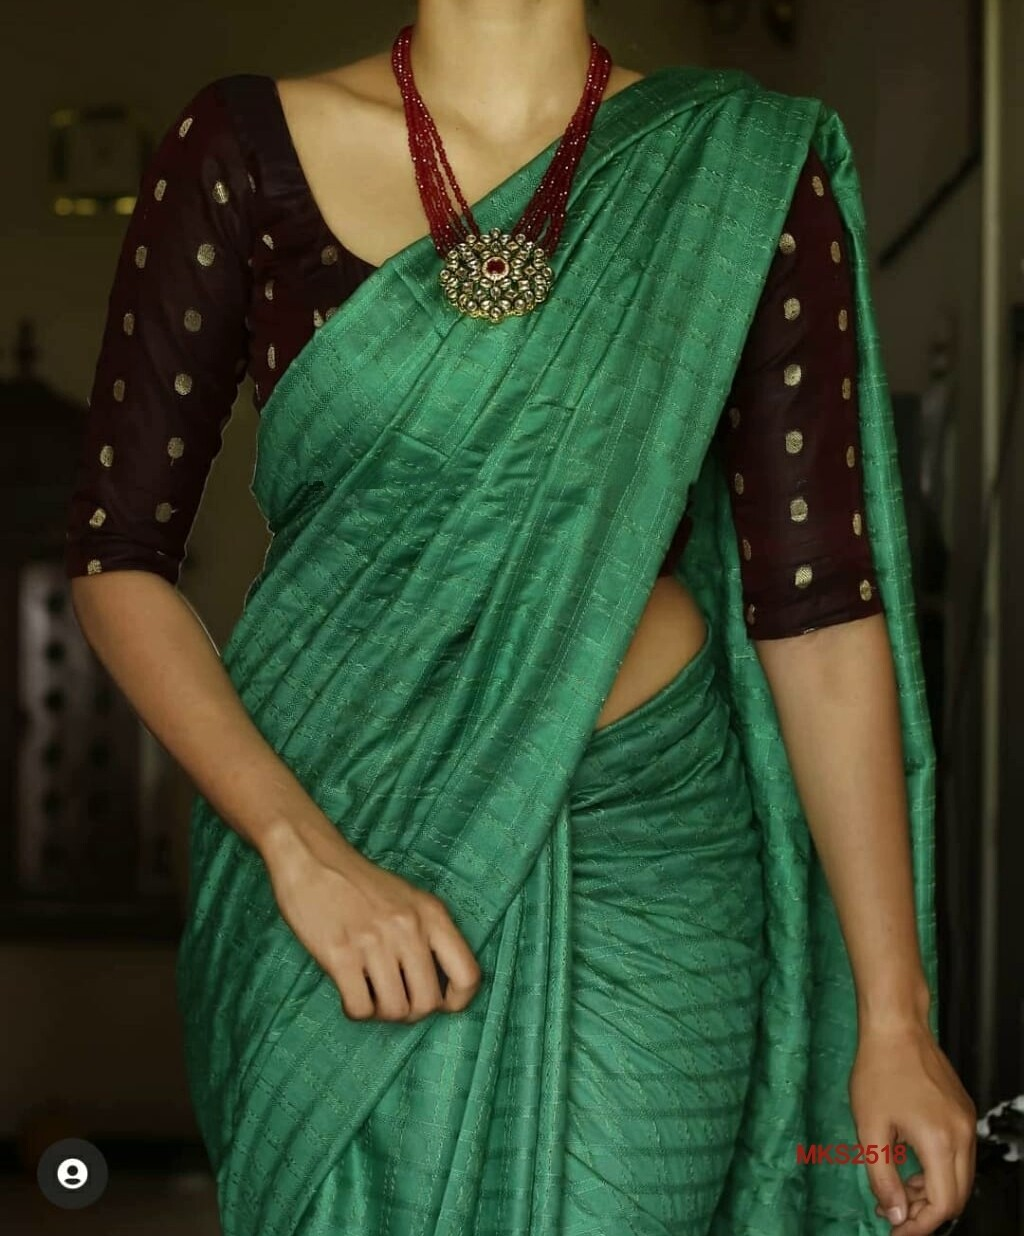 Semi Katan by Steple sarees with beautiful new dobby weaving design